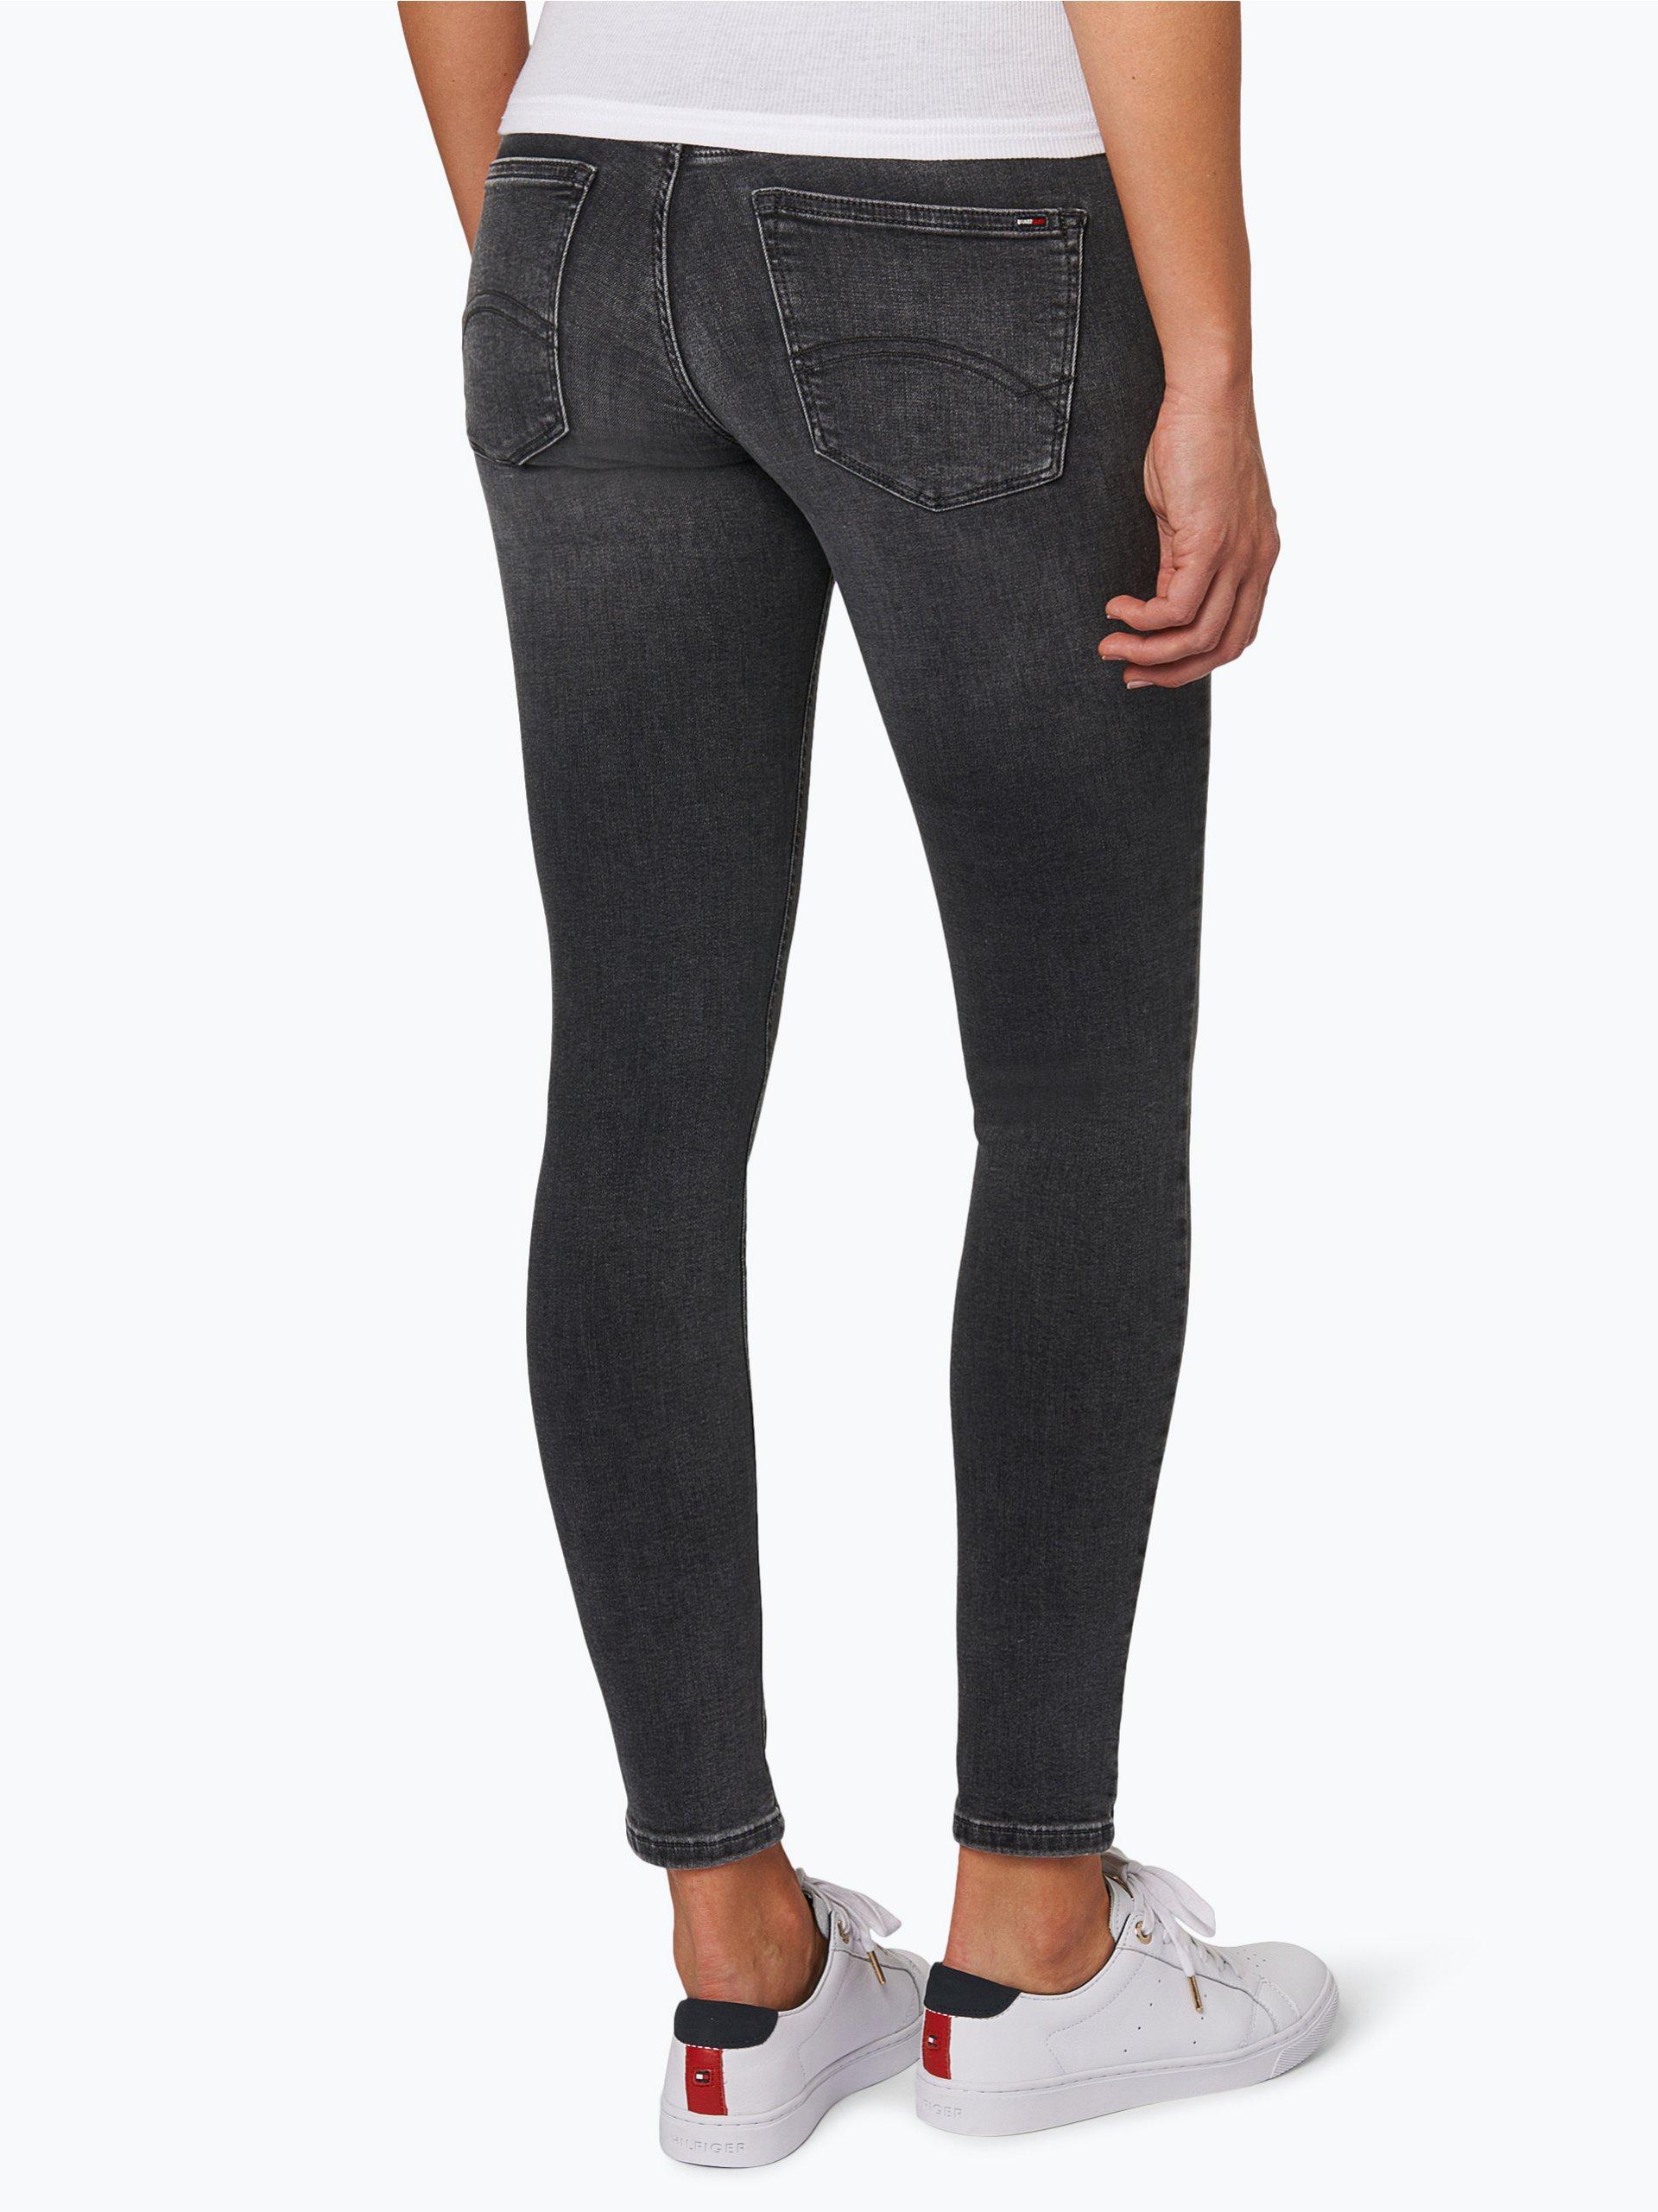 tommy jeans damen jeans nora 7 8 grau uni online kaufen. Black Bedroom Furniture Sets. Home Design Ideas